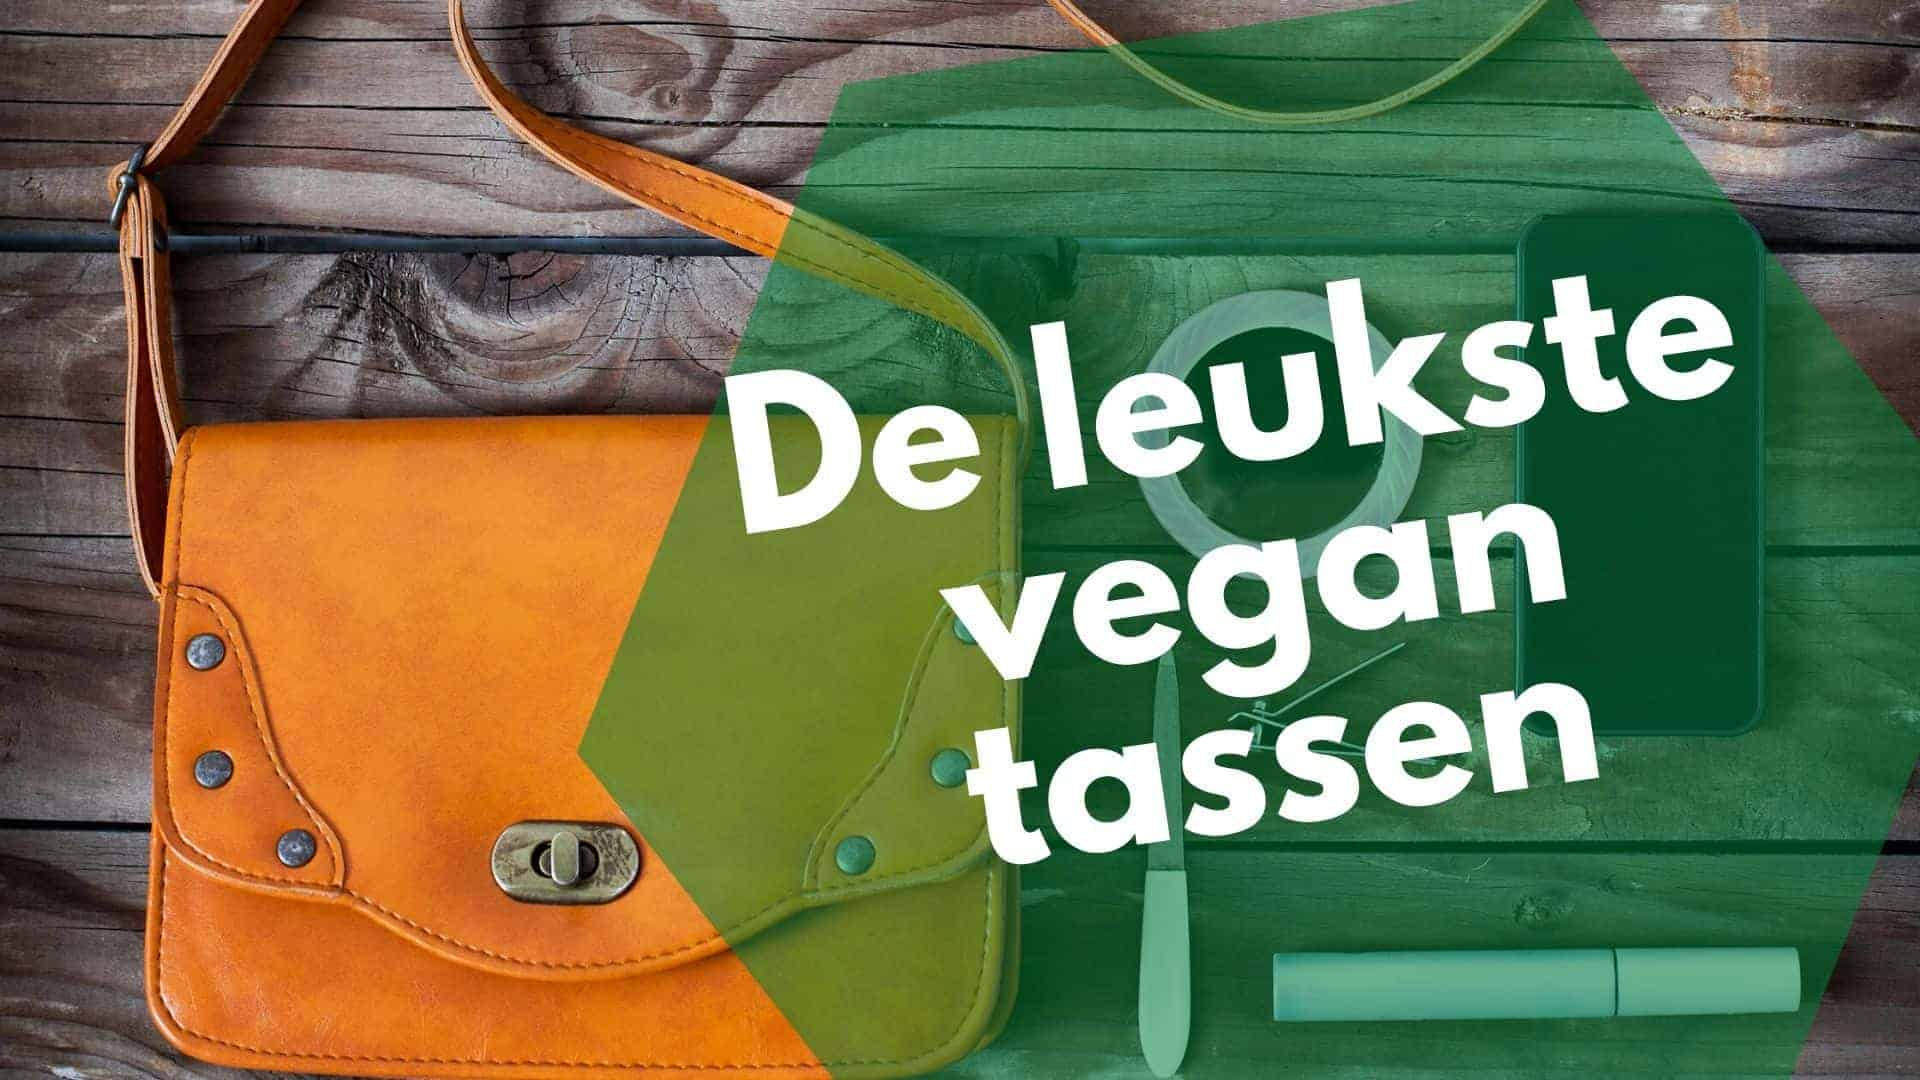 14 leukste vegan tassen beoordeeld voor hem & haar